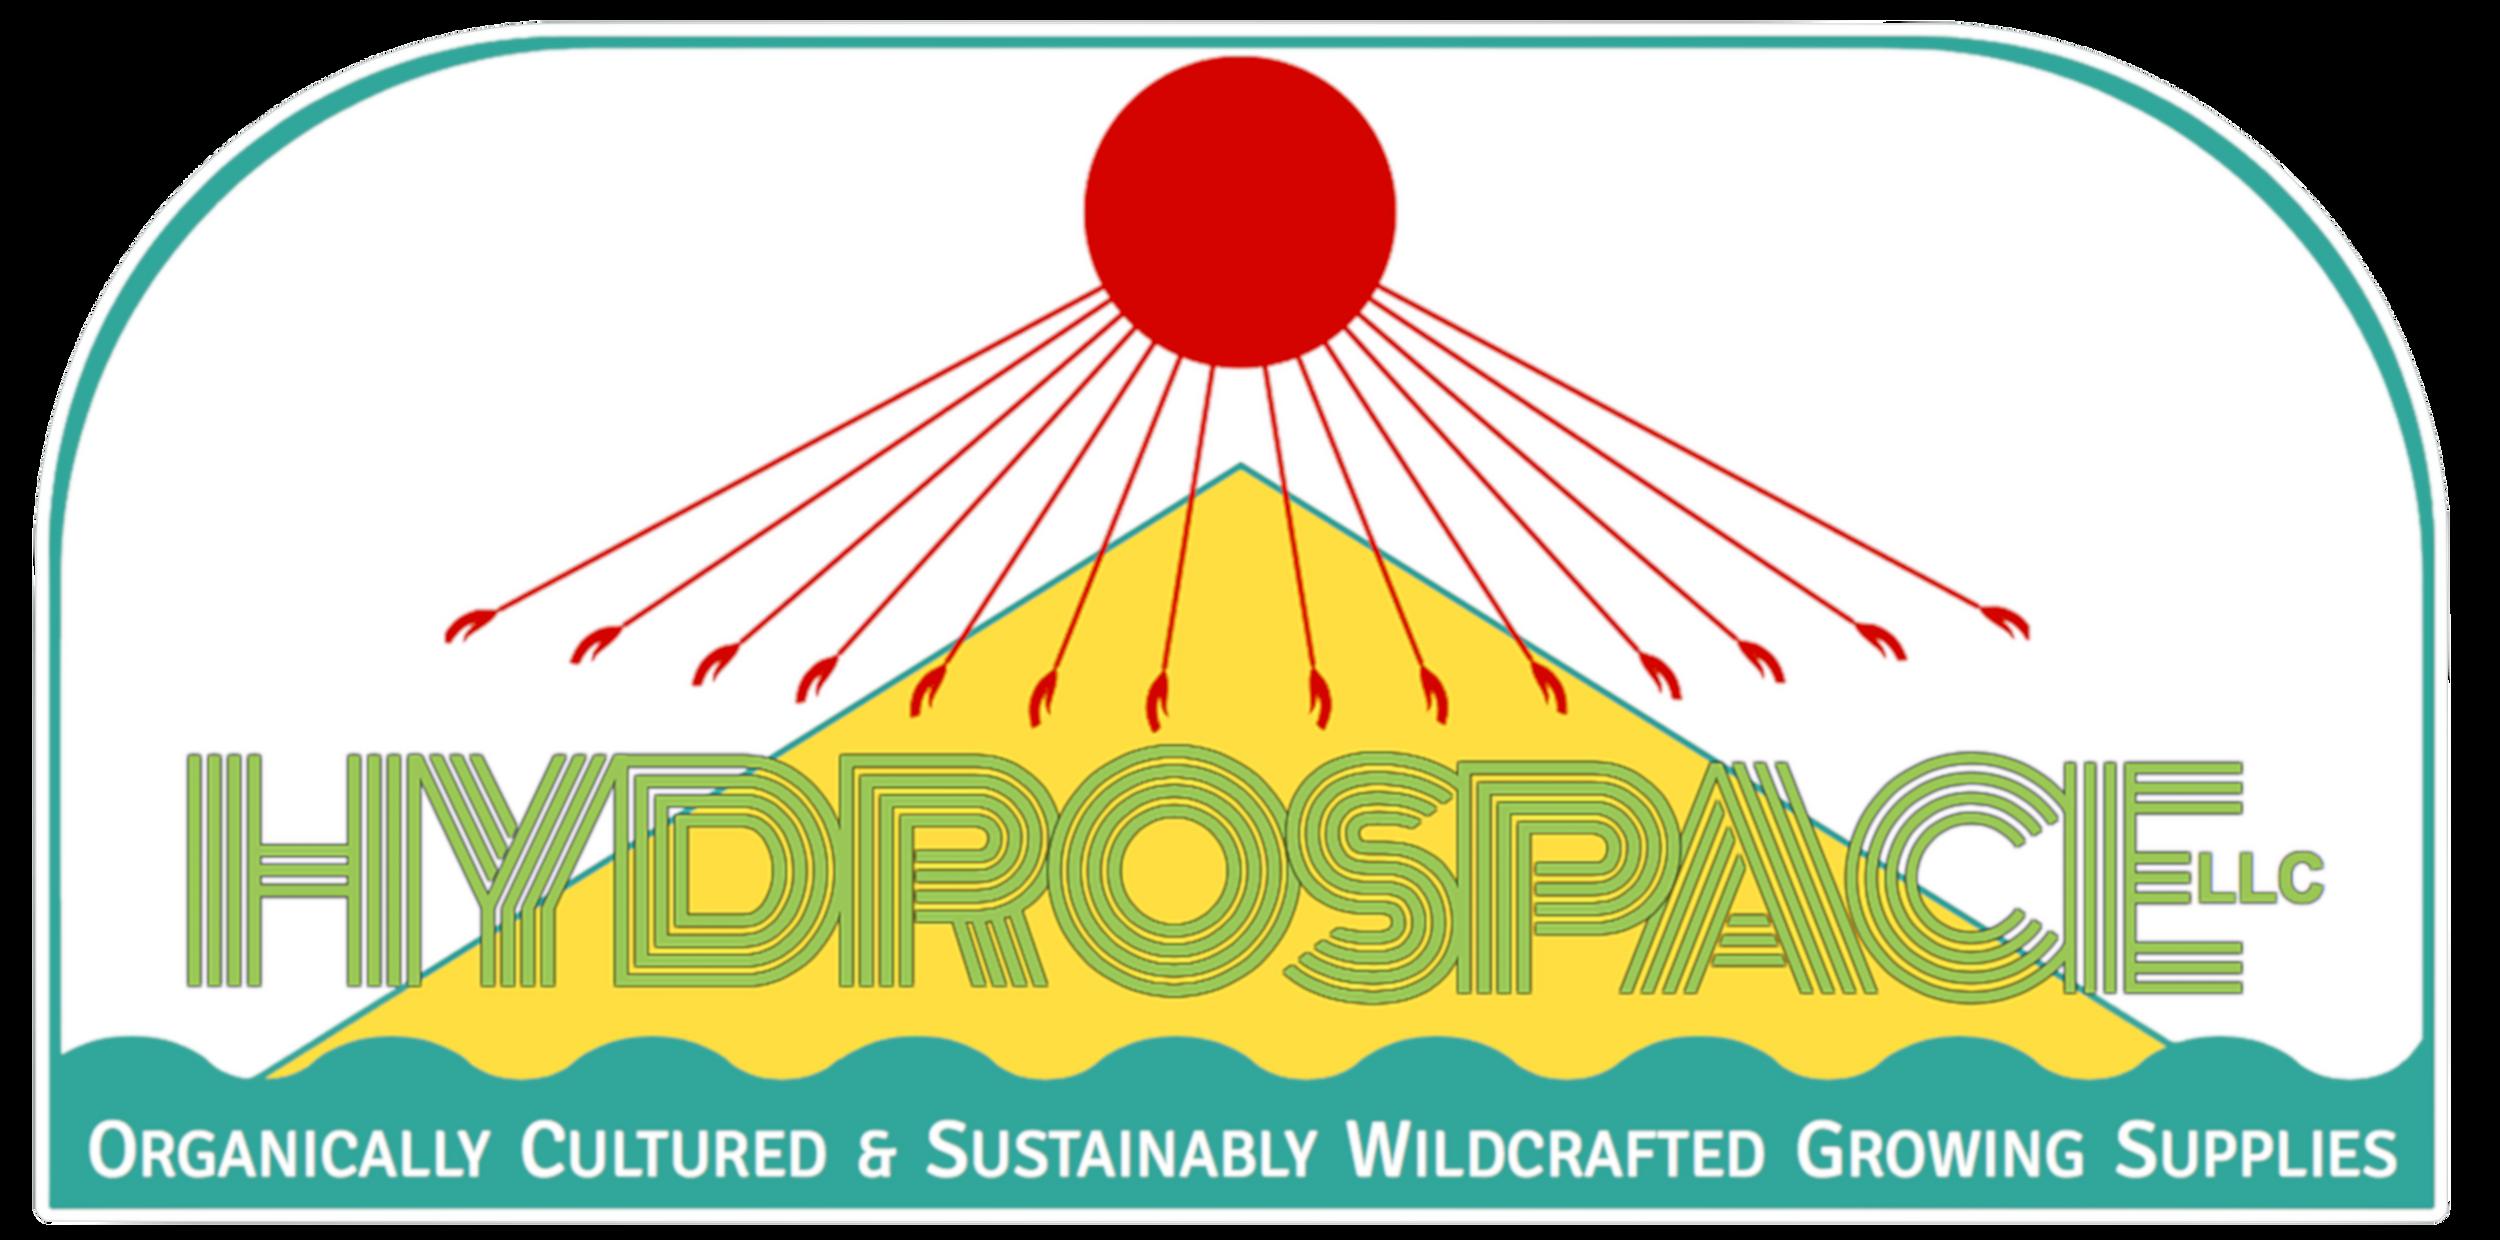 www.hydrospace.store